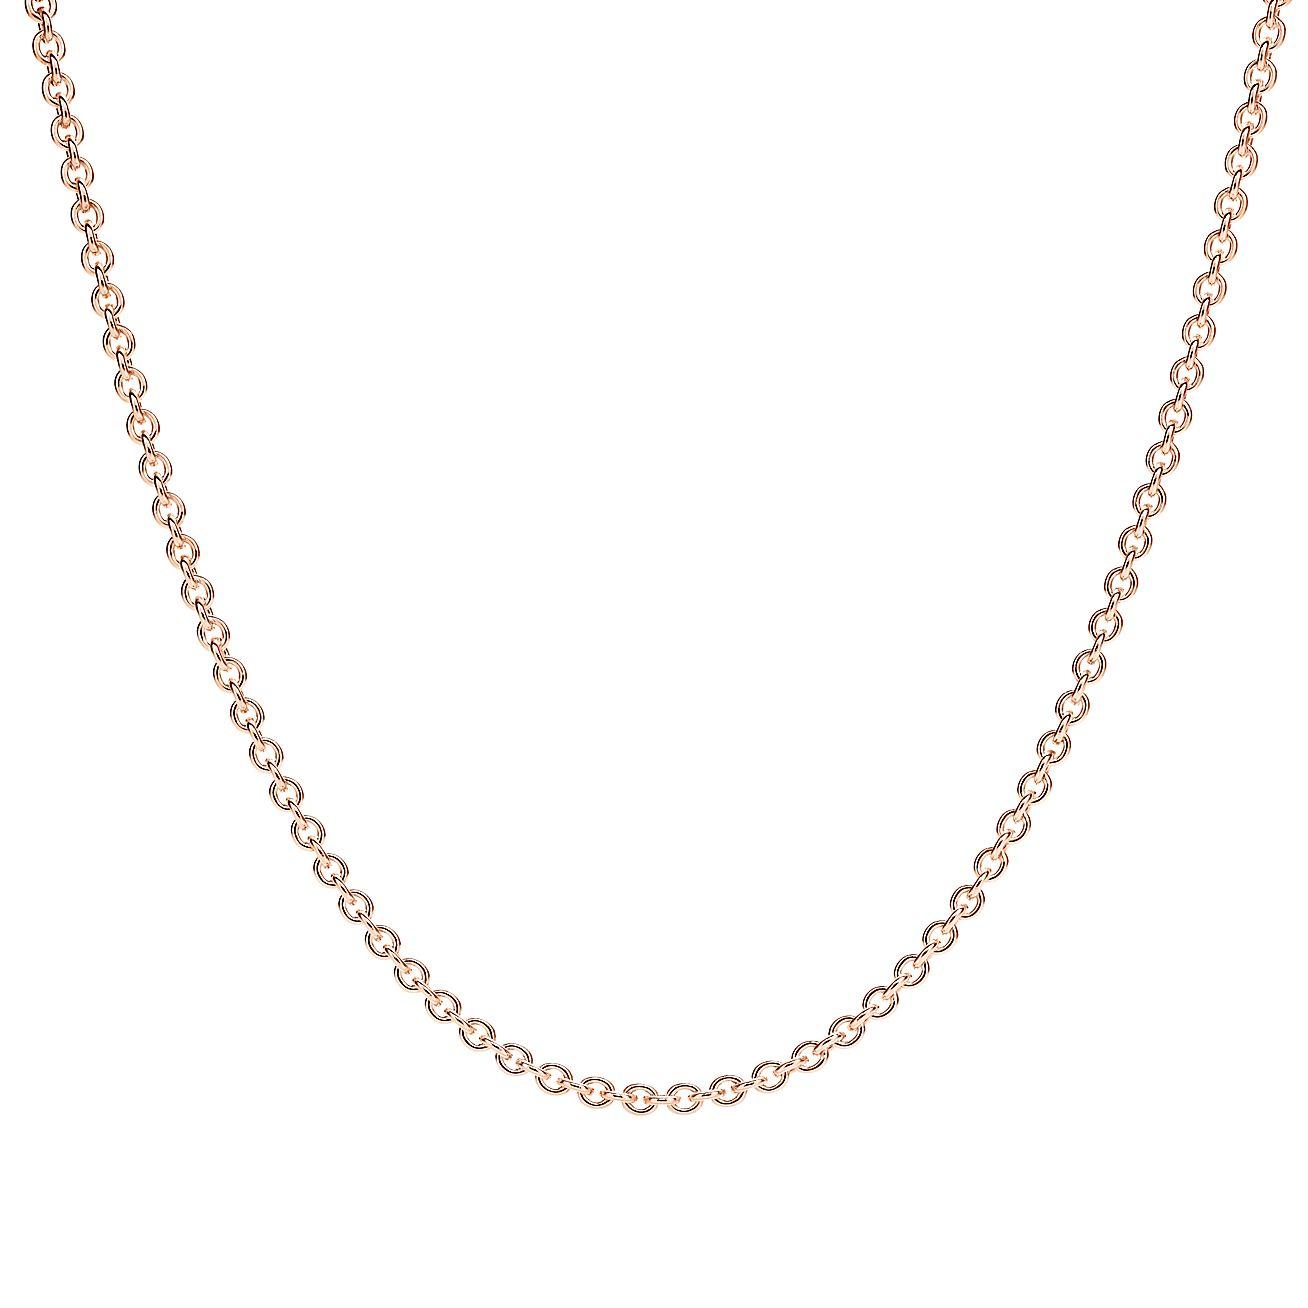 Chain in 18k rose gold 370e31de1